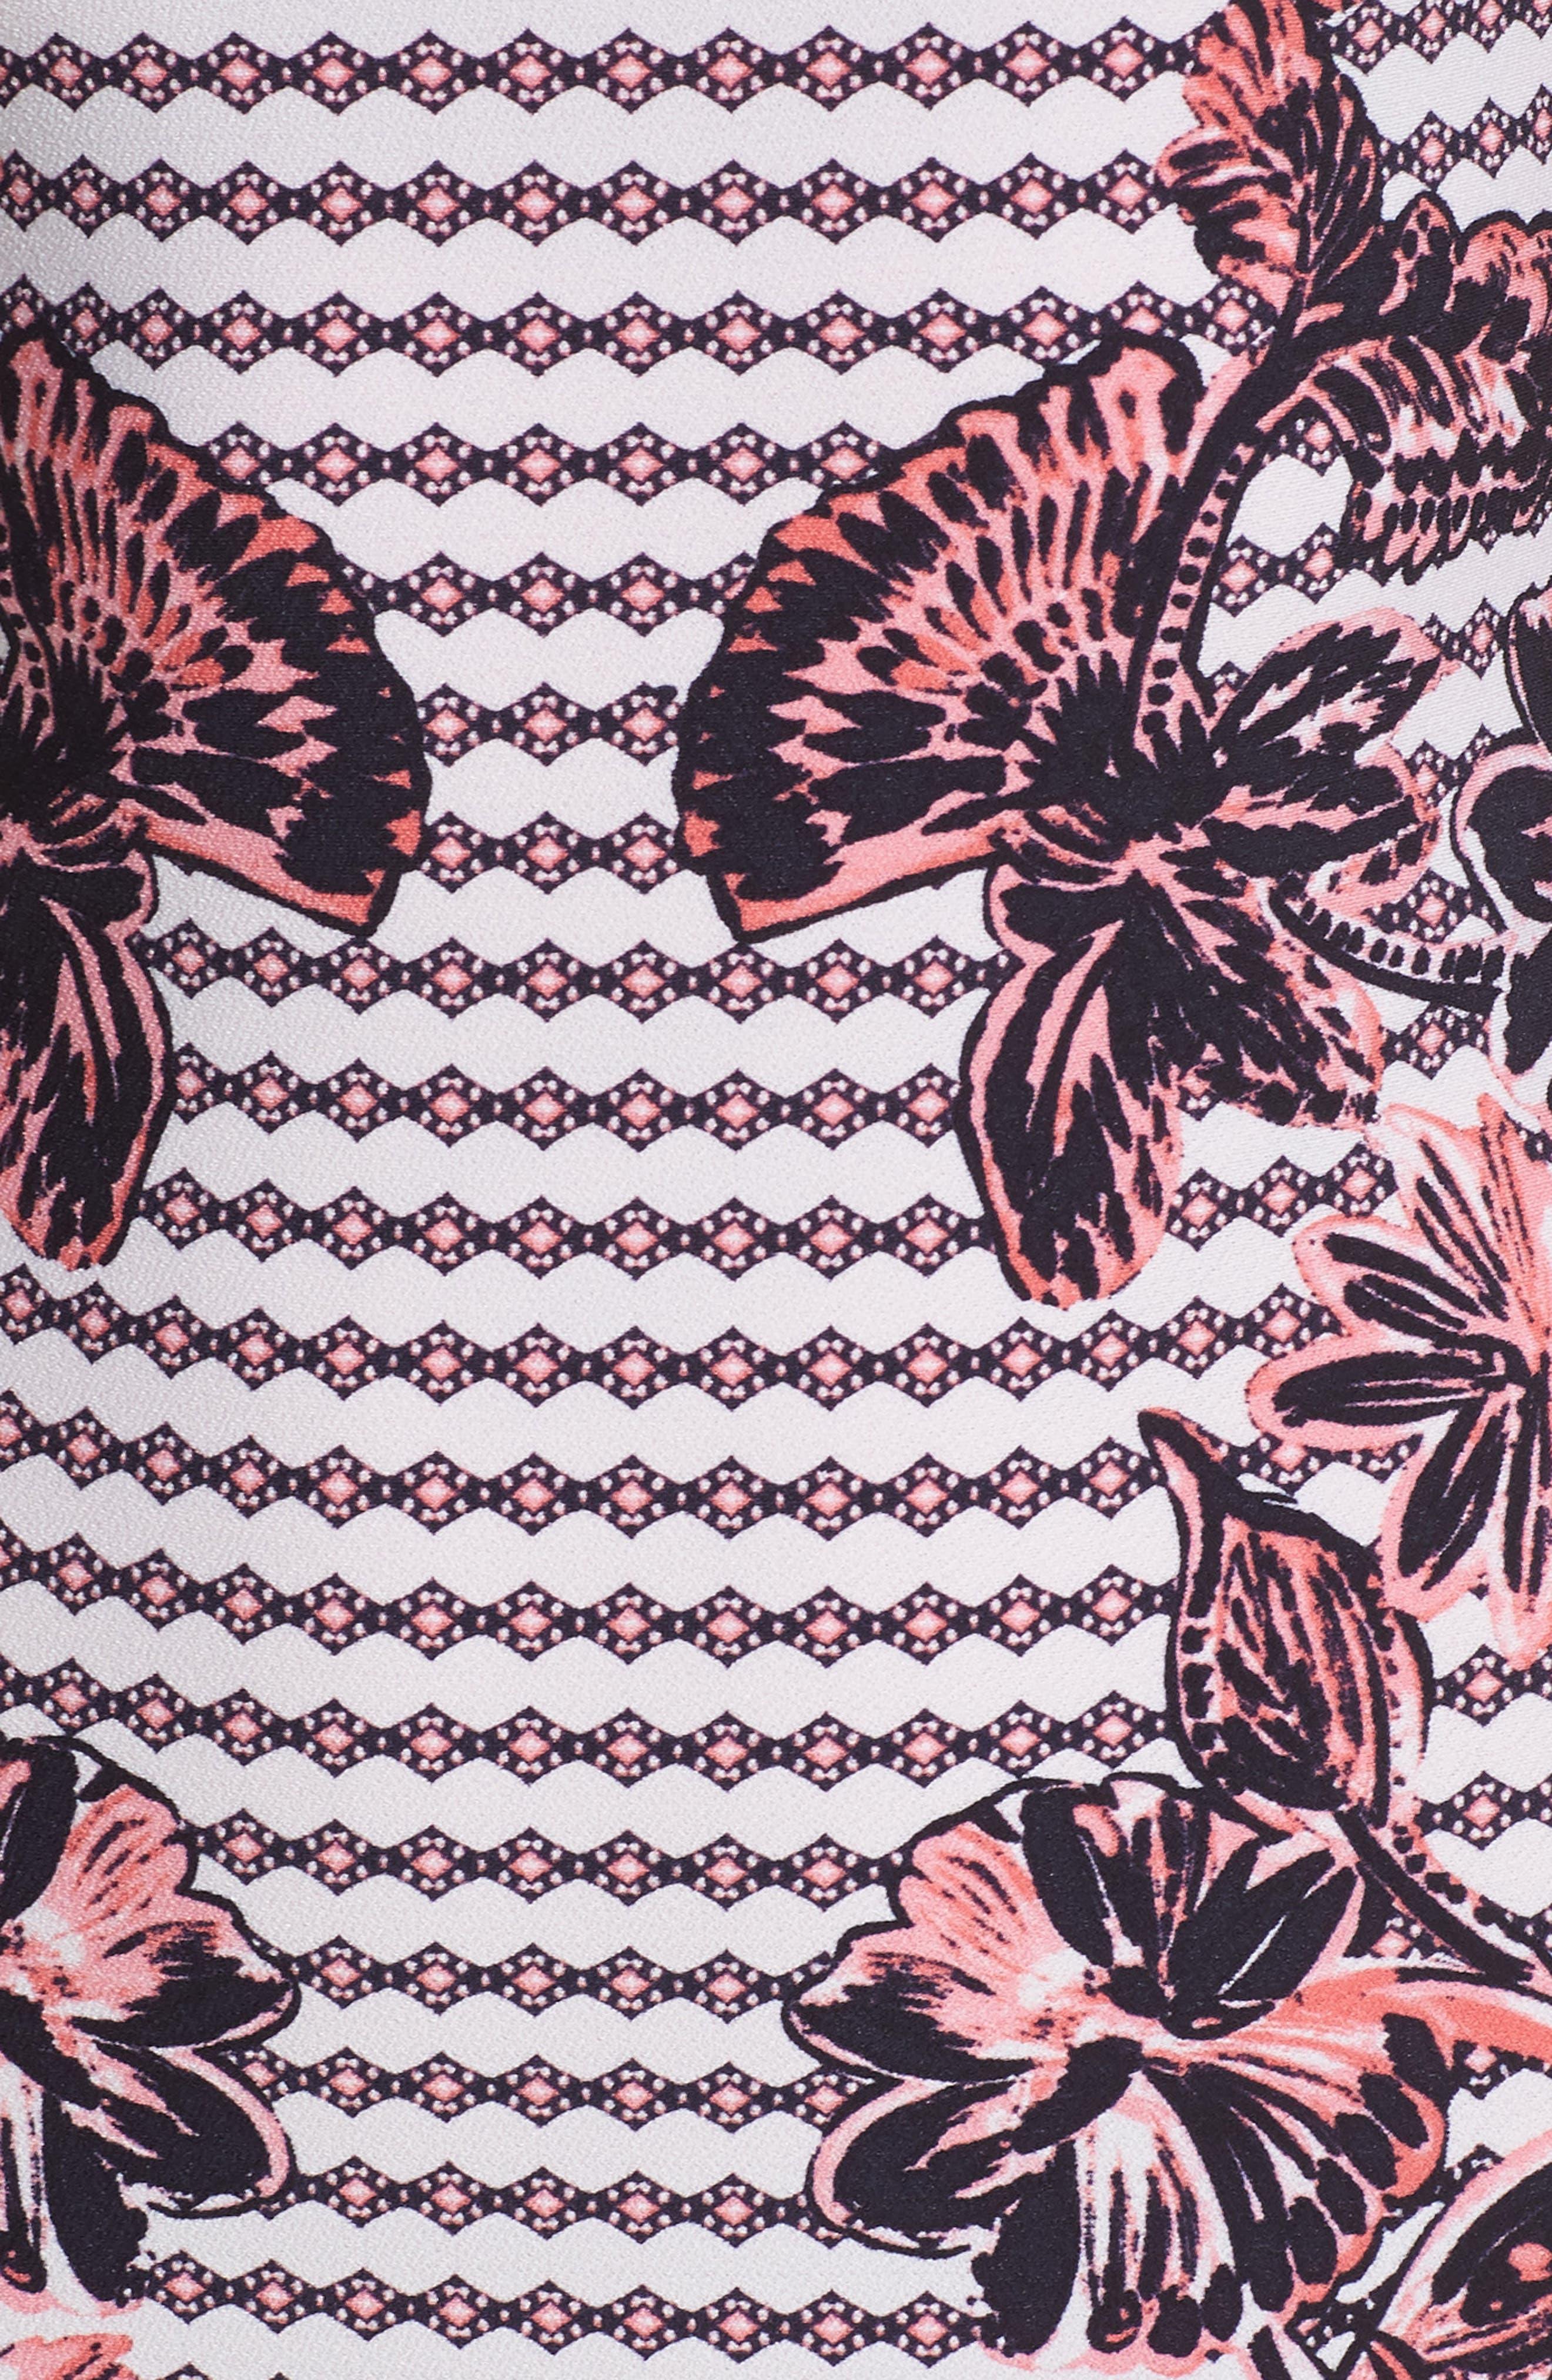 Print Scuba Crepe Sheath Dress,                             Alternate thumbnail 6, color,                             410